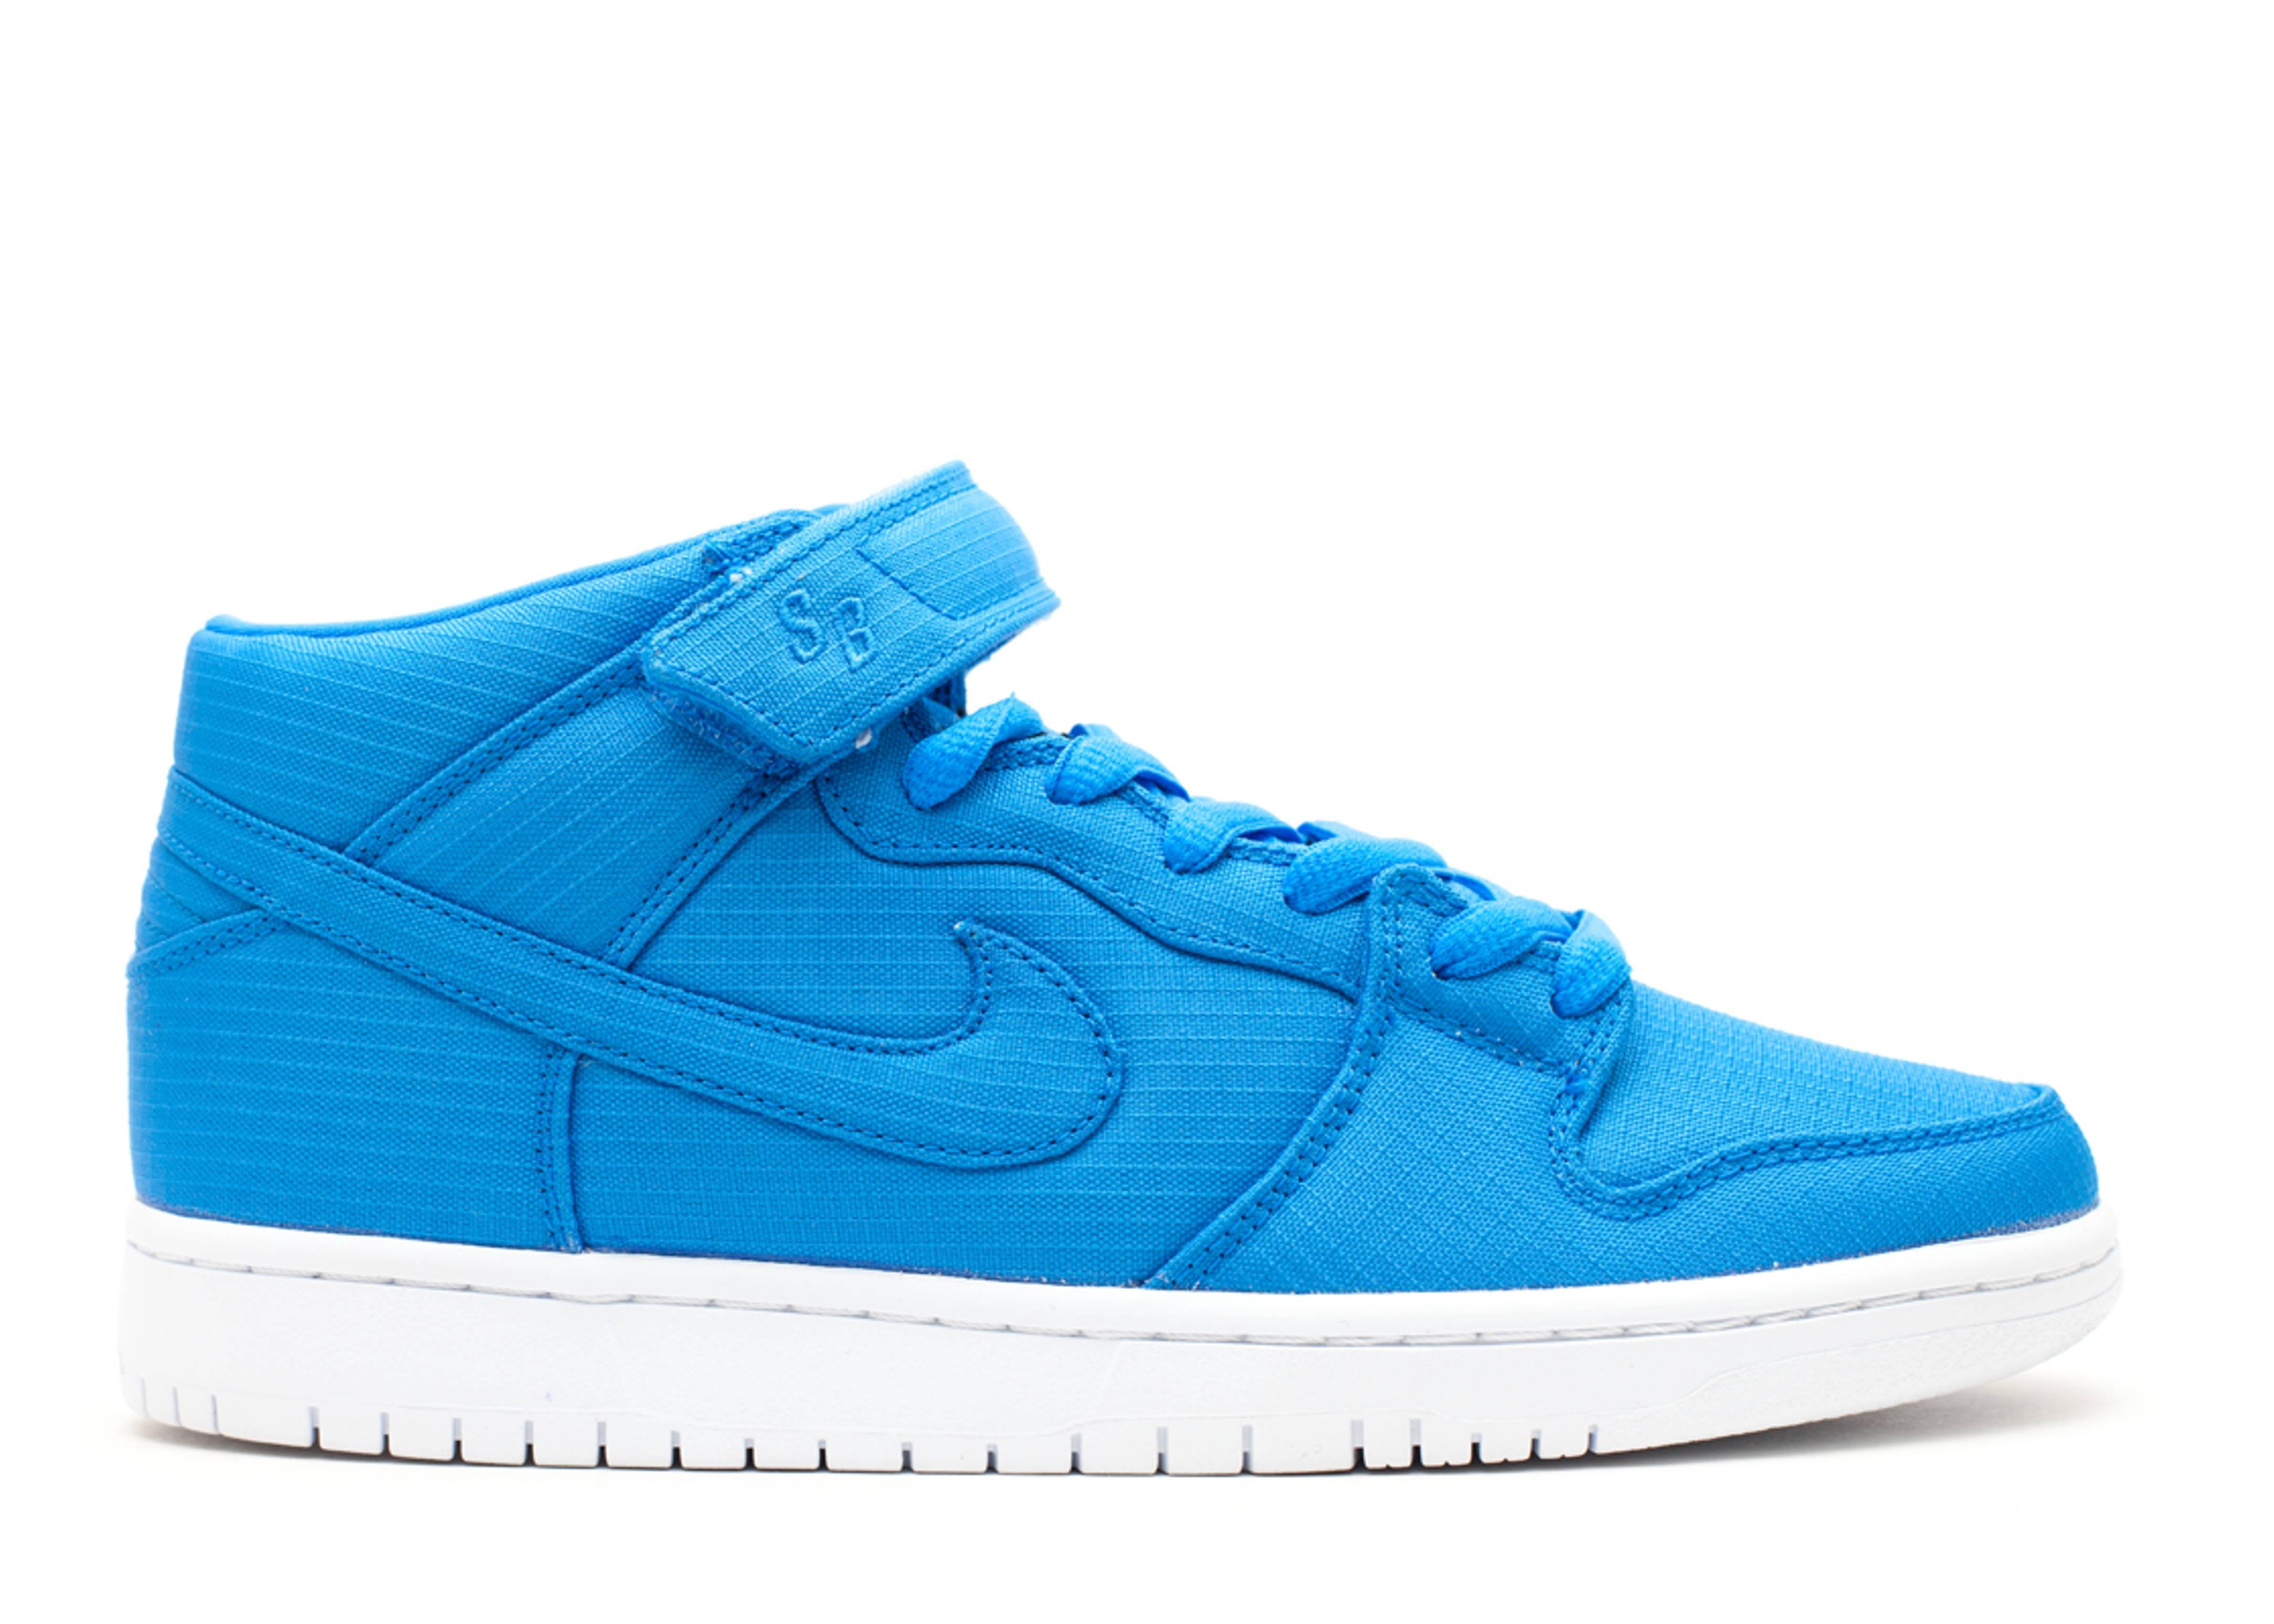 Dunk Mid Pro Sb - Nike - 314383 441 - photo blue white-photo blue ... 289a0fcf9